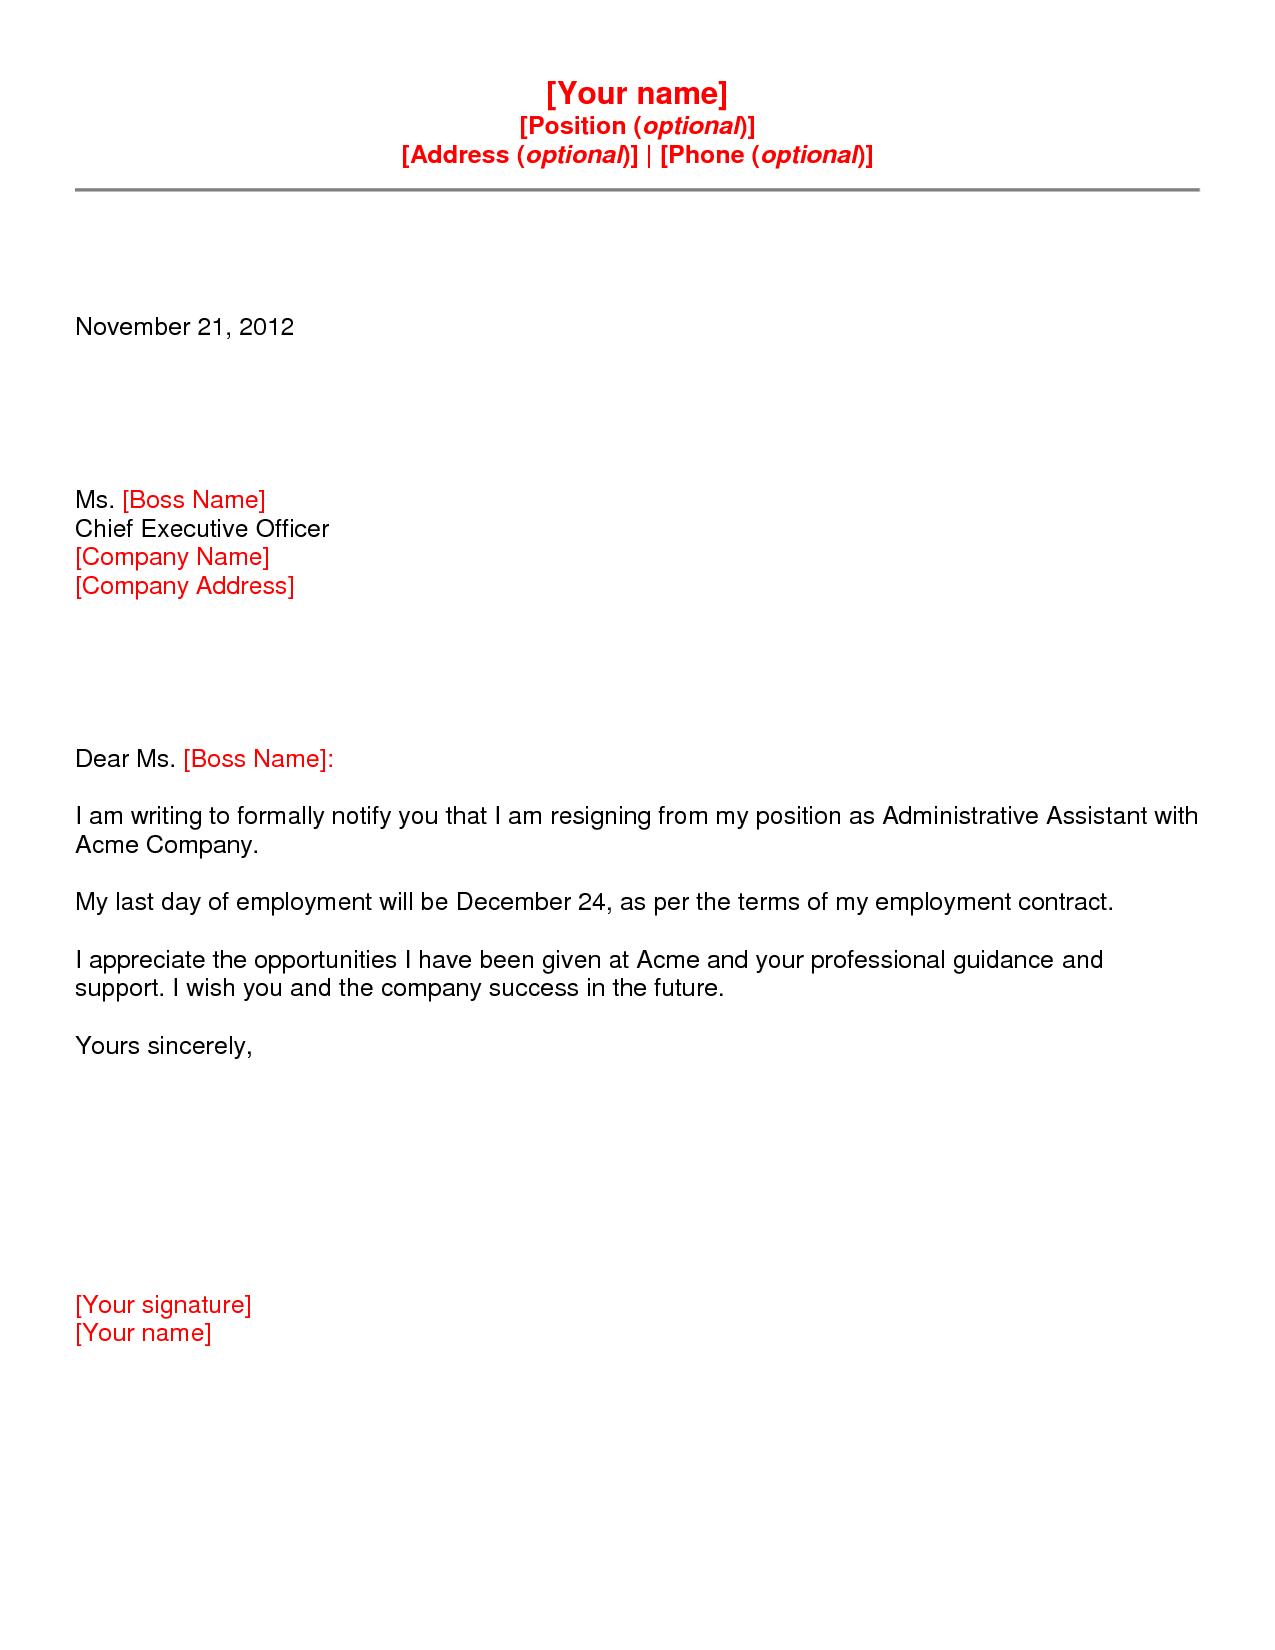 Medical Assistant Resignation Letter from cdn.quotesgram.com